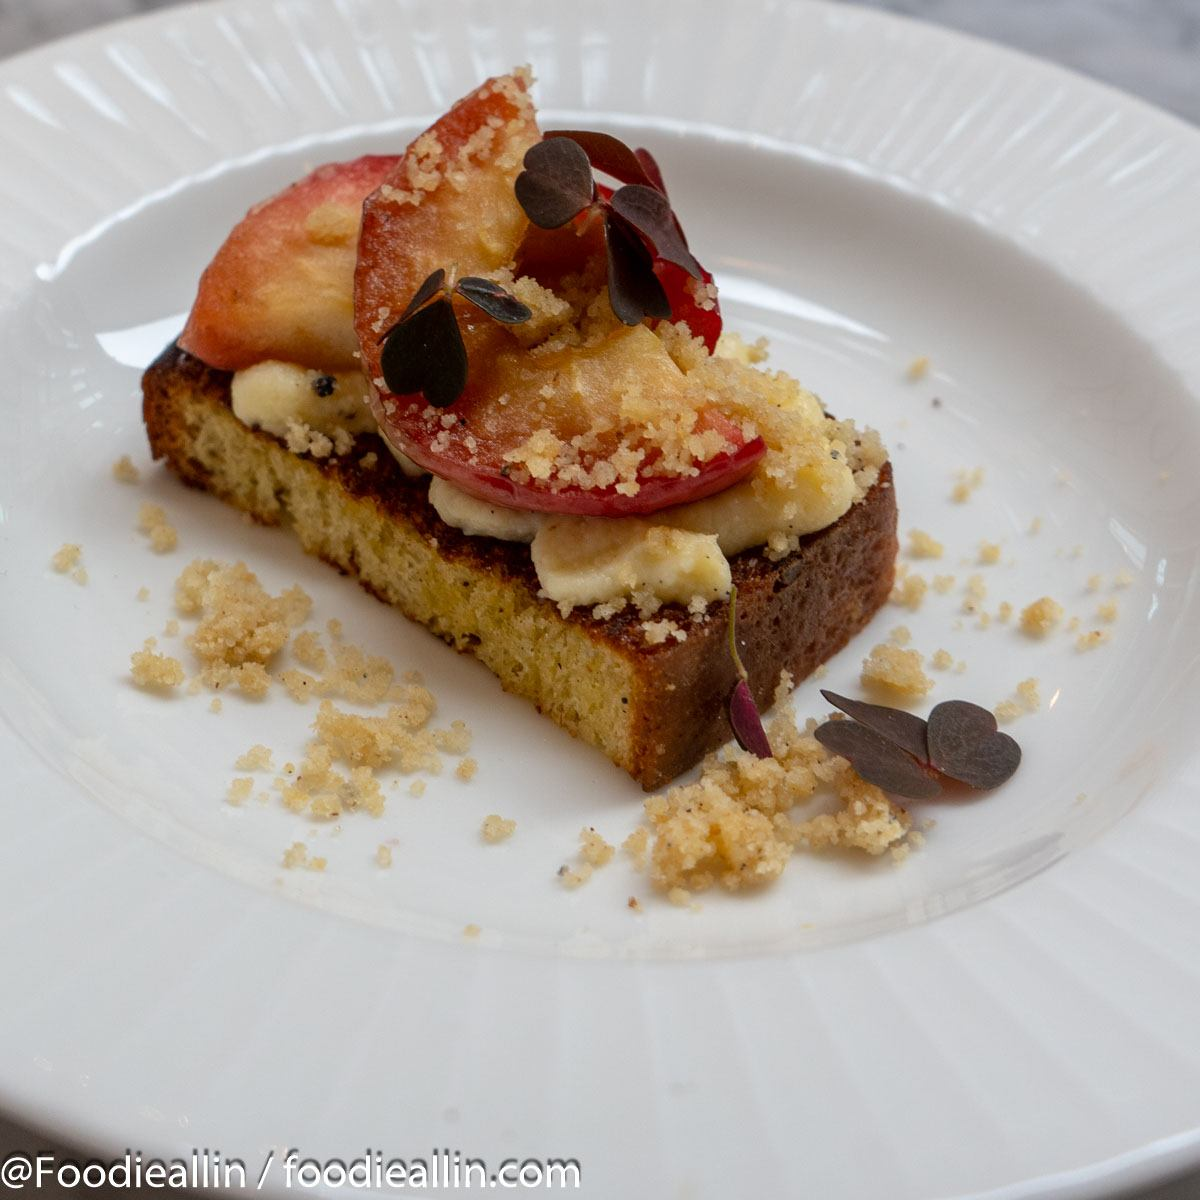 French toast Brioche, baked apple, vanilla cream, cardamom crumbs